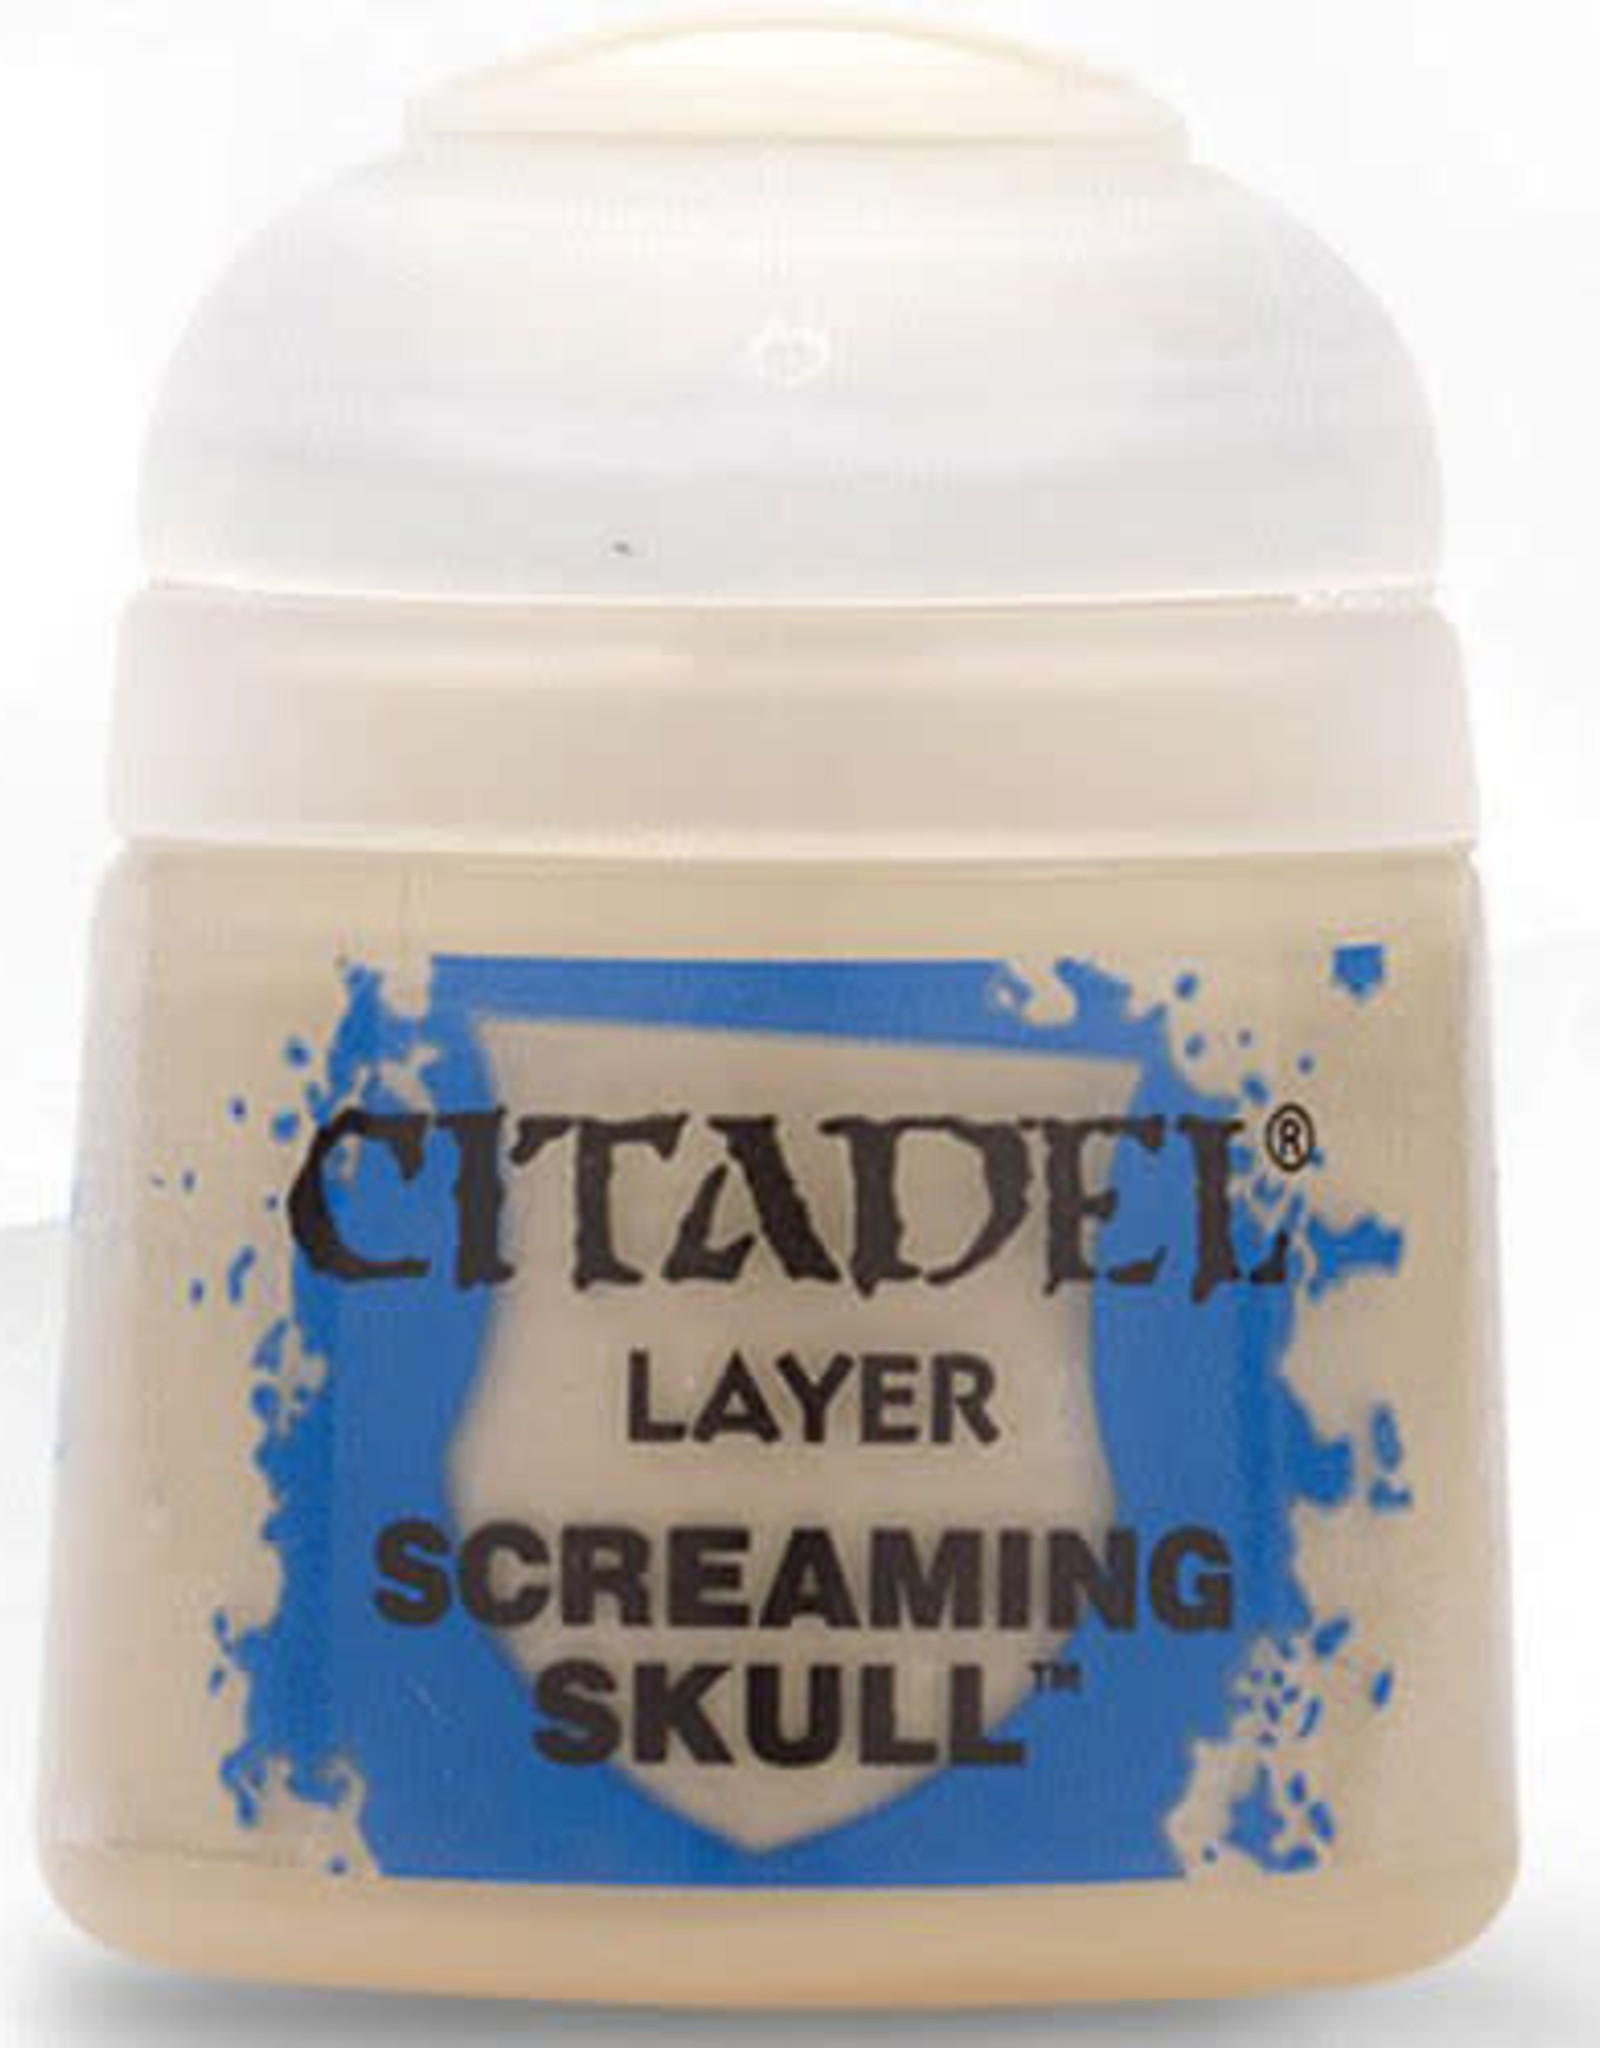 Citadel Layer Paint: Screaming Skull